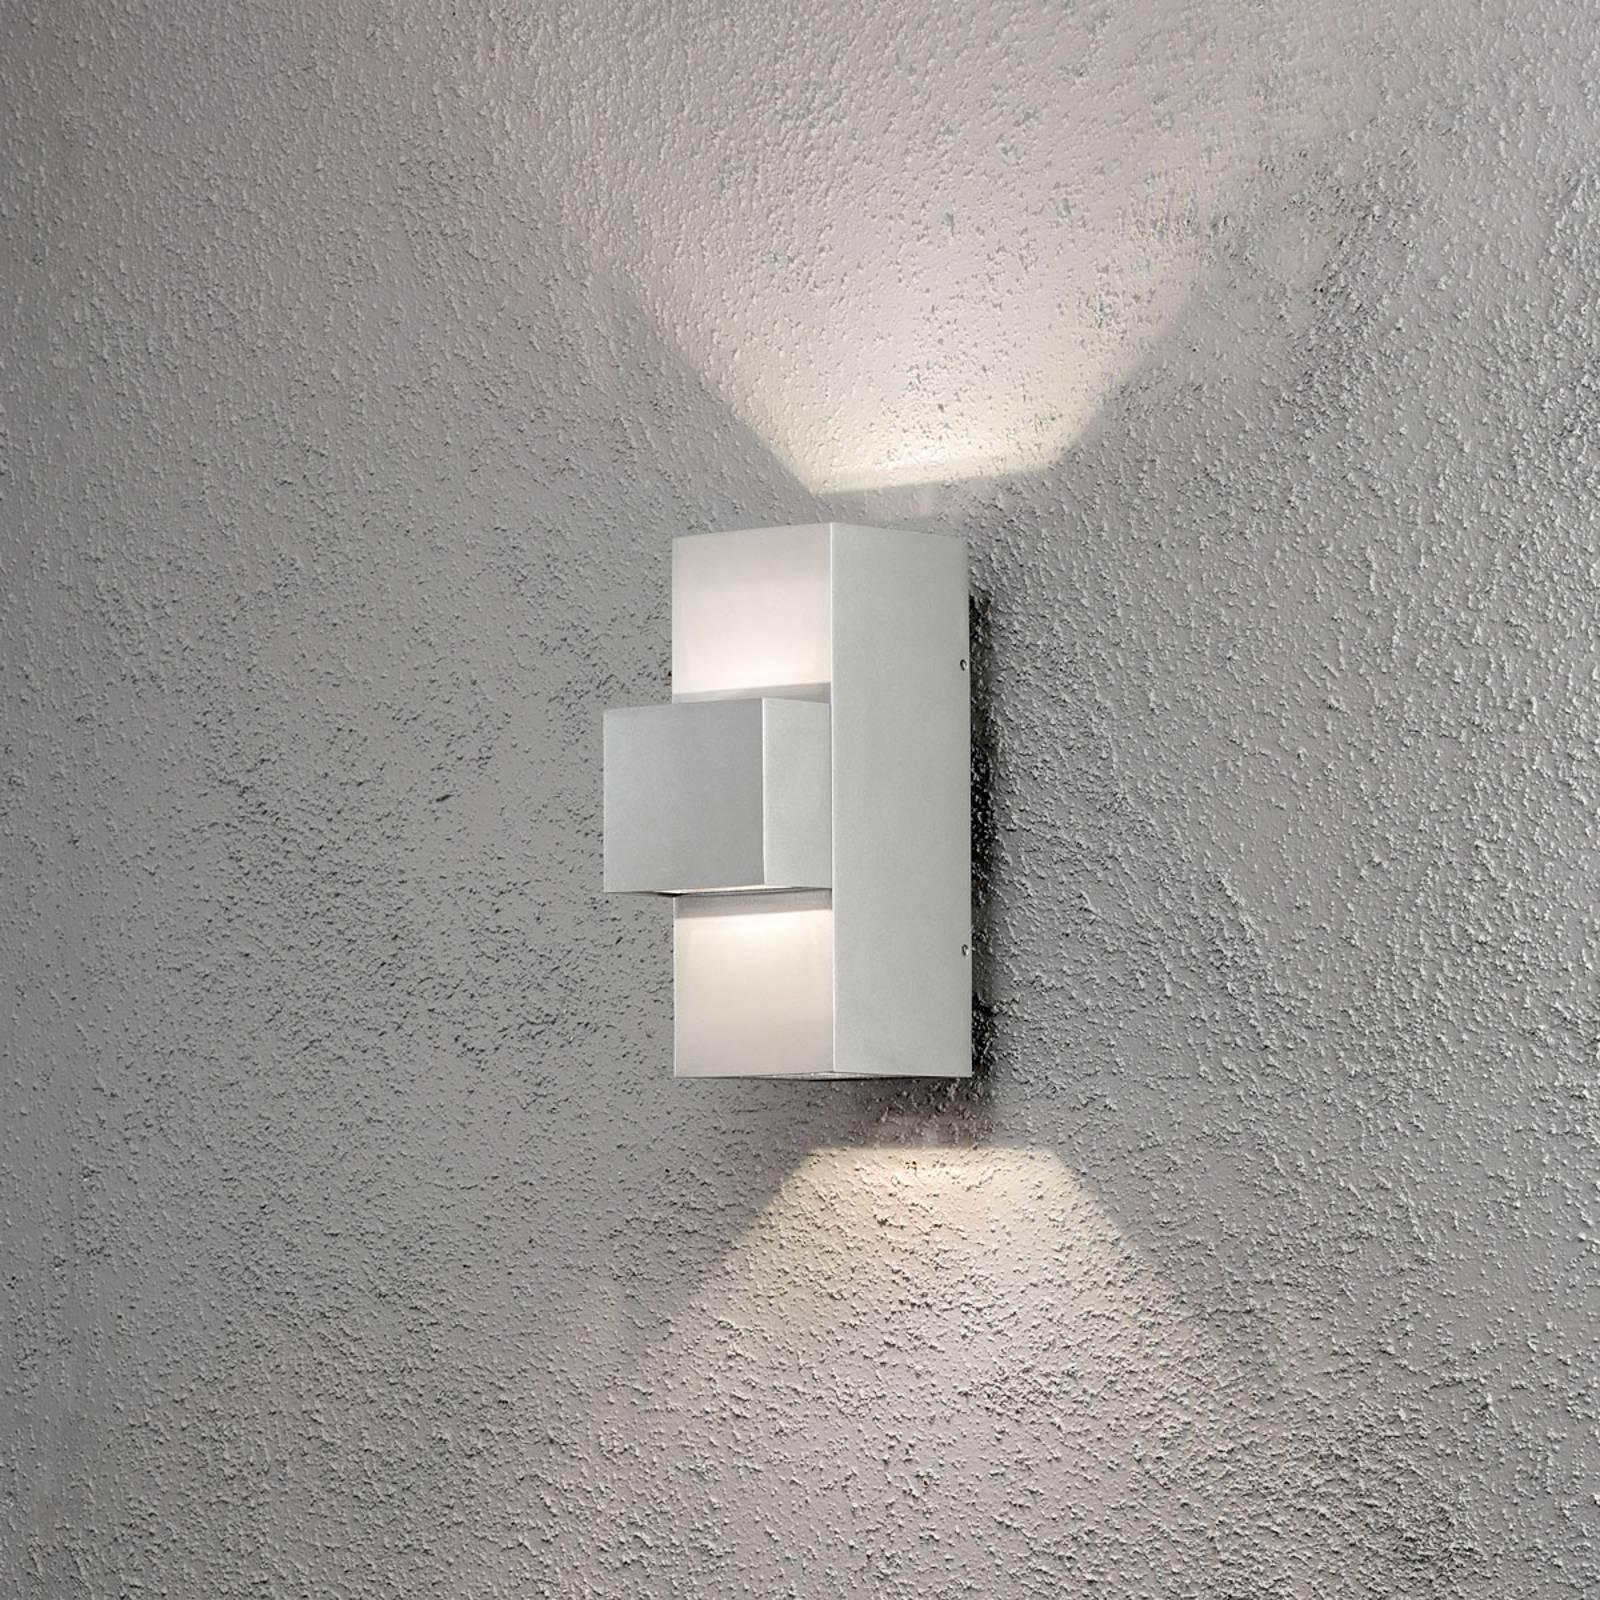 LED-Außenwandleuchte Imola, 3-flammig